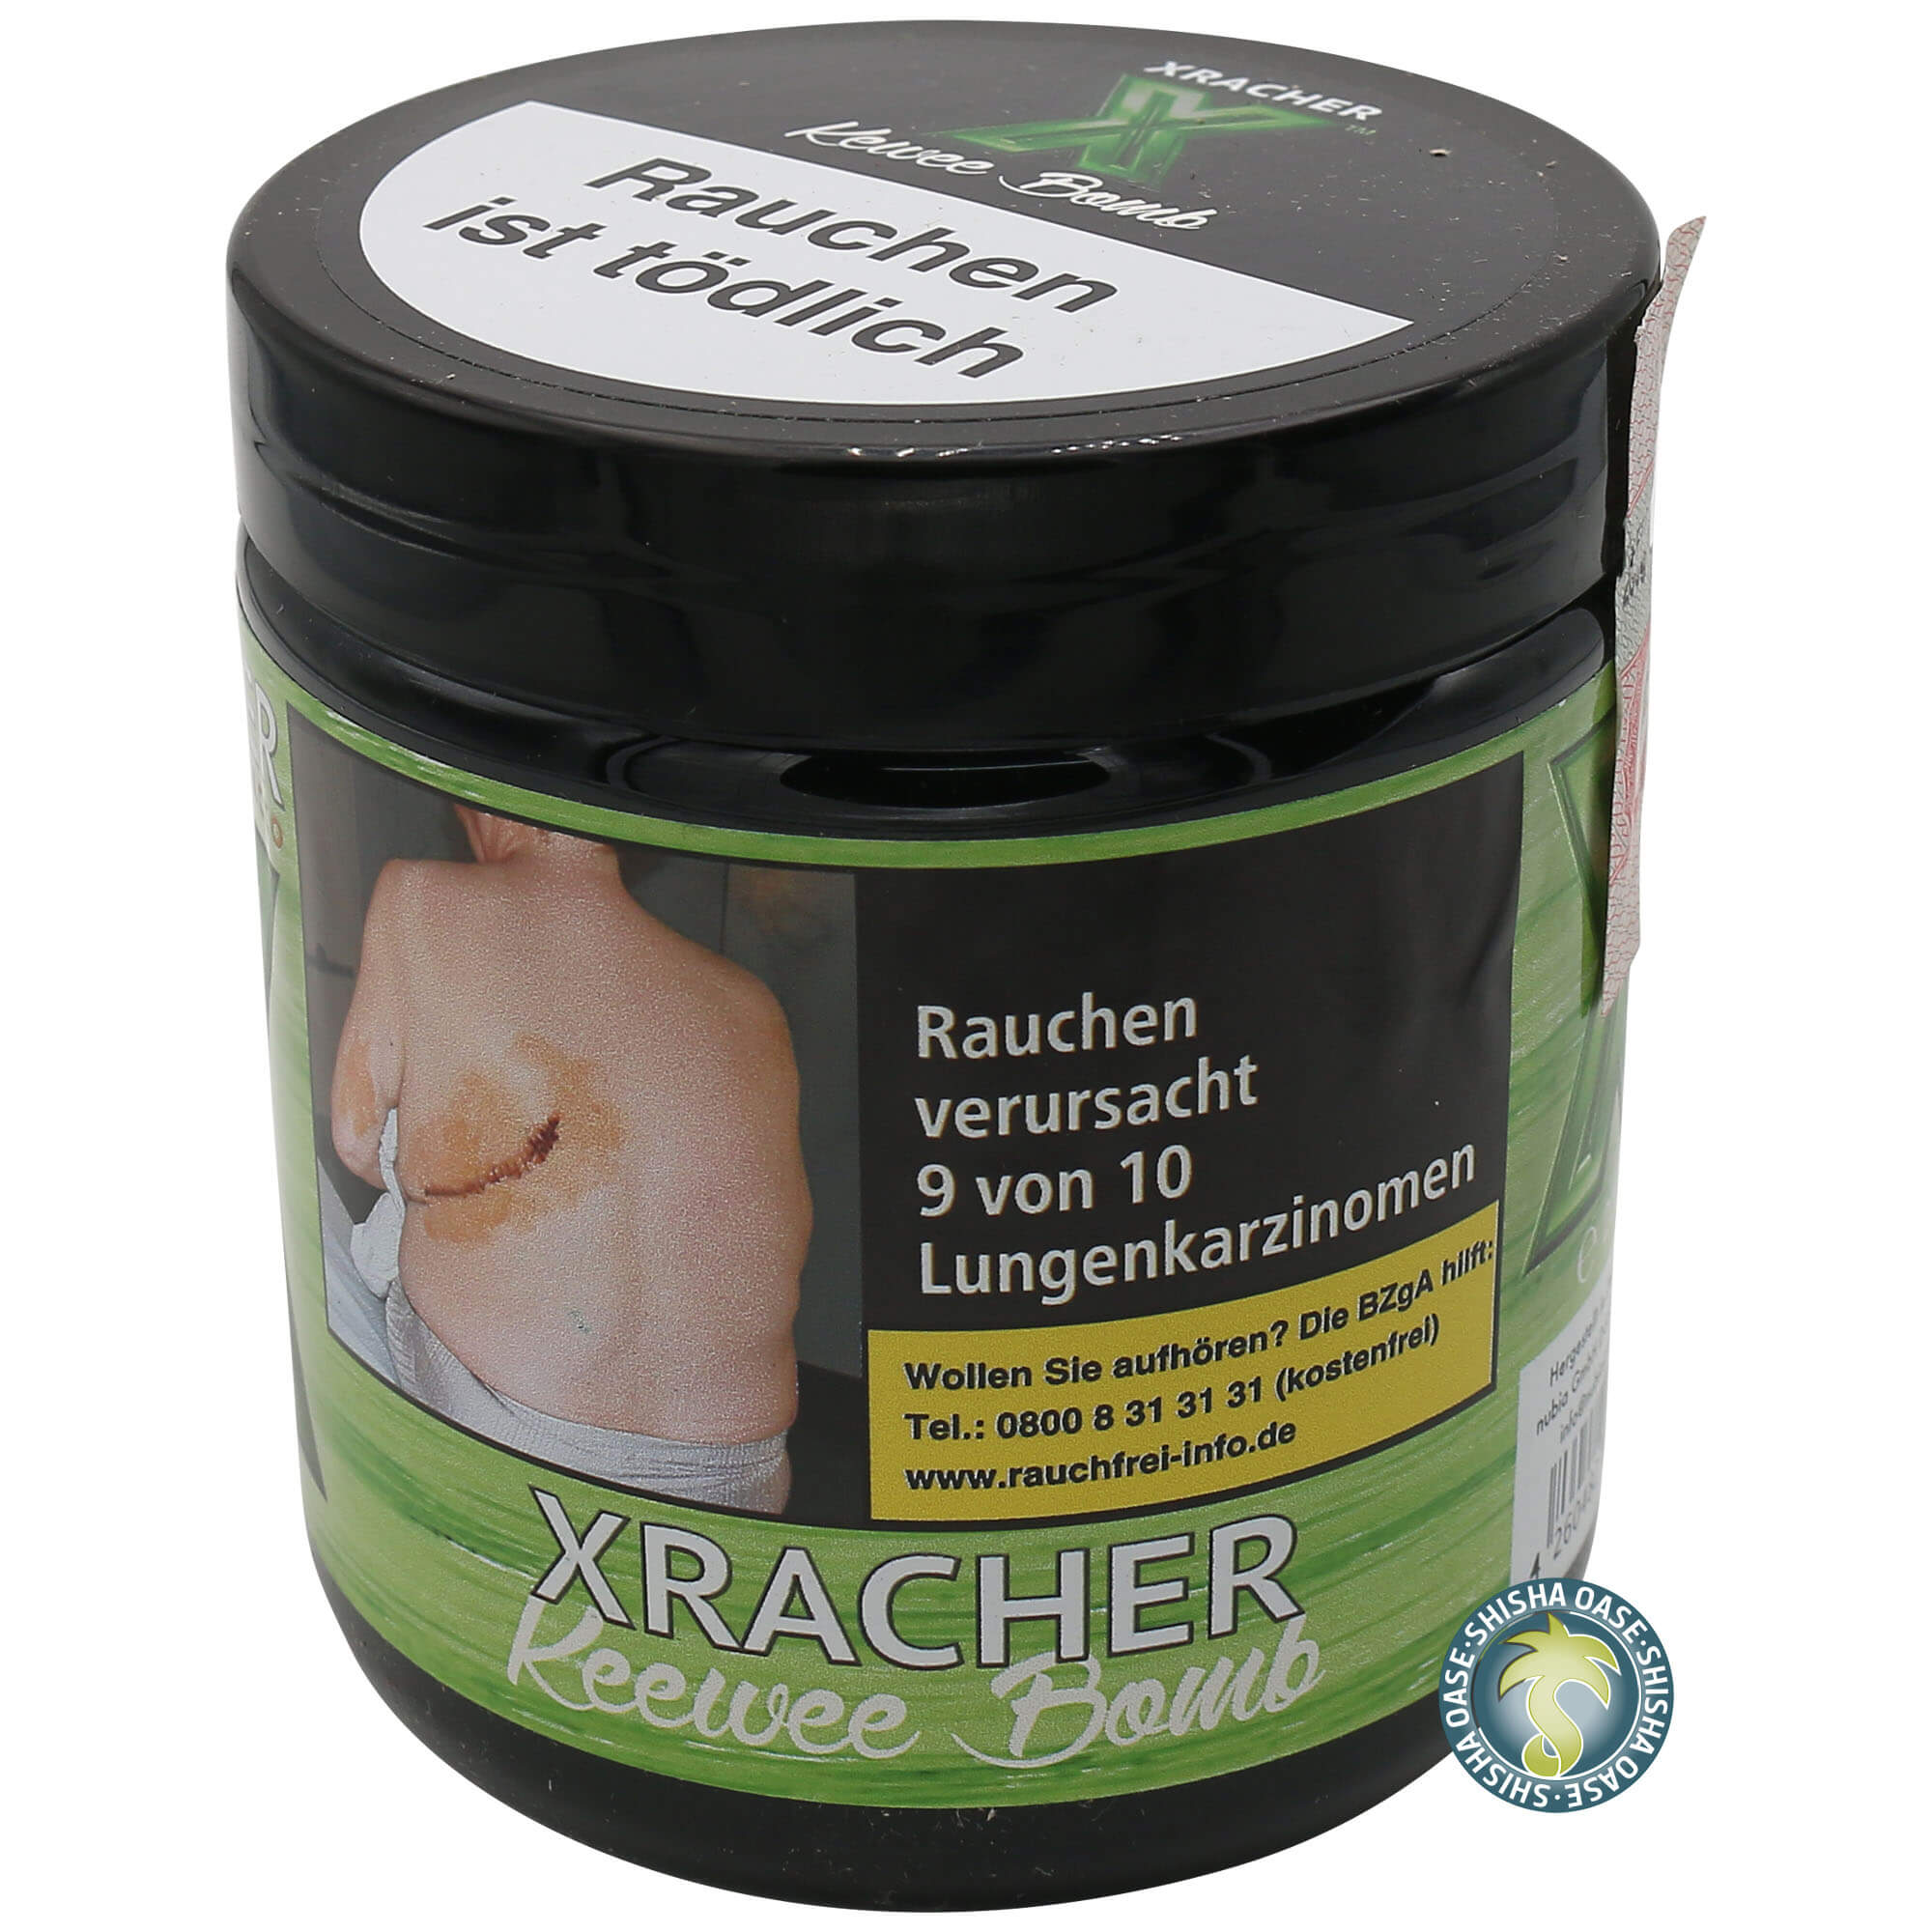 XRacher Tabak Keewee Bomb 200g